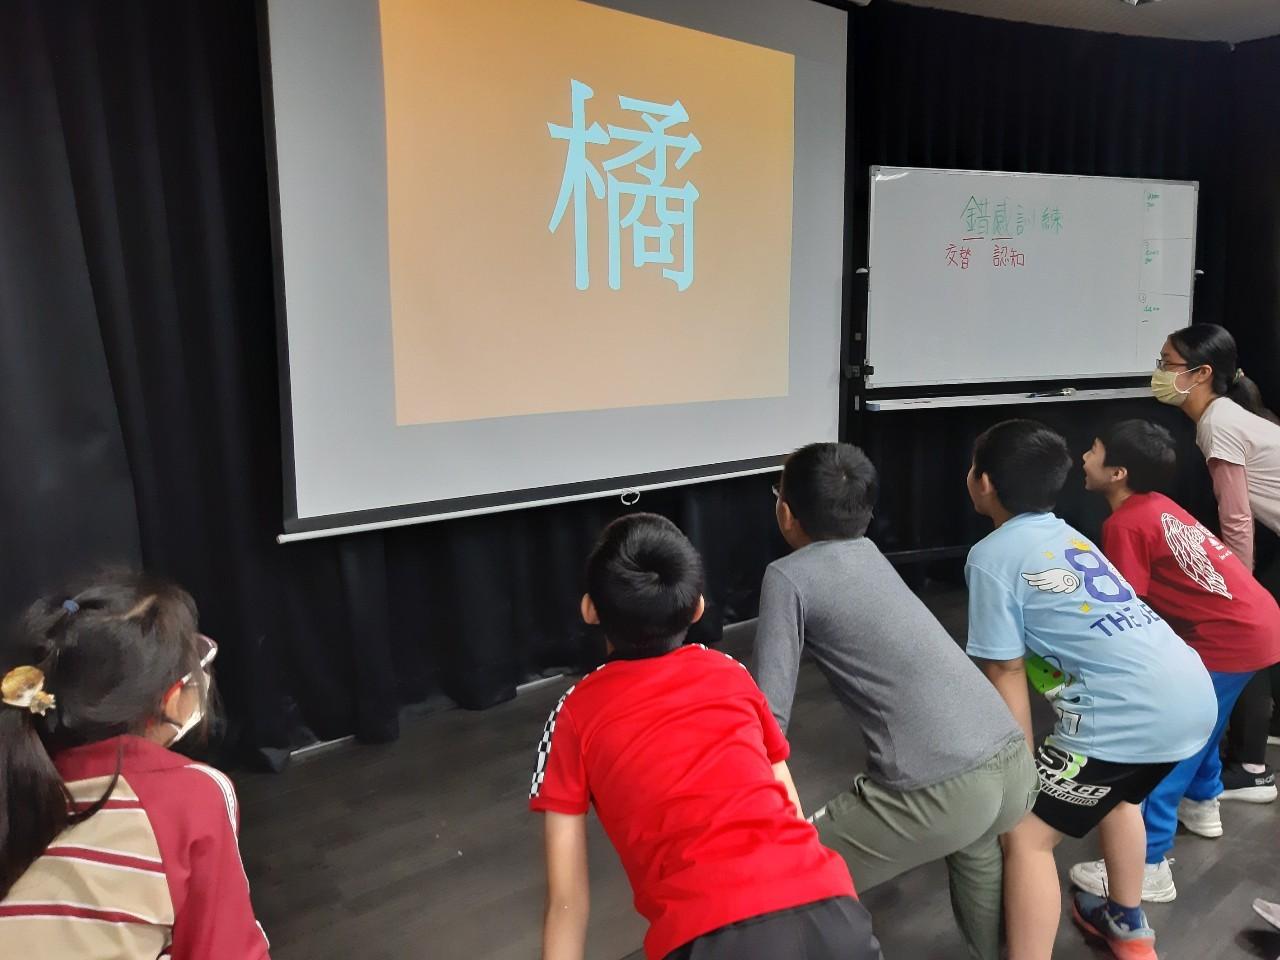 【資優獵鷹班】(新竹) Lesson 5. 錯感訓練